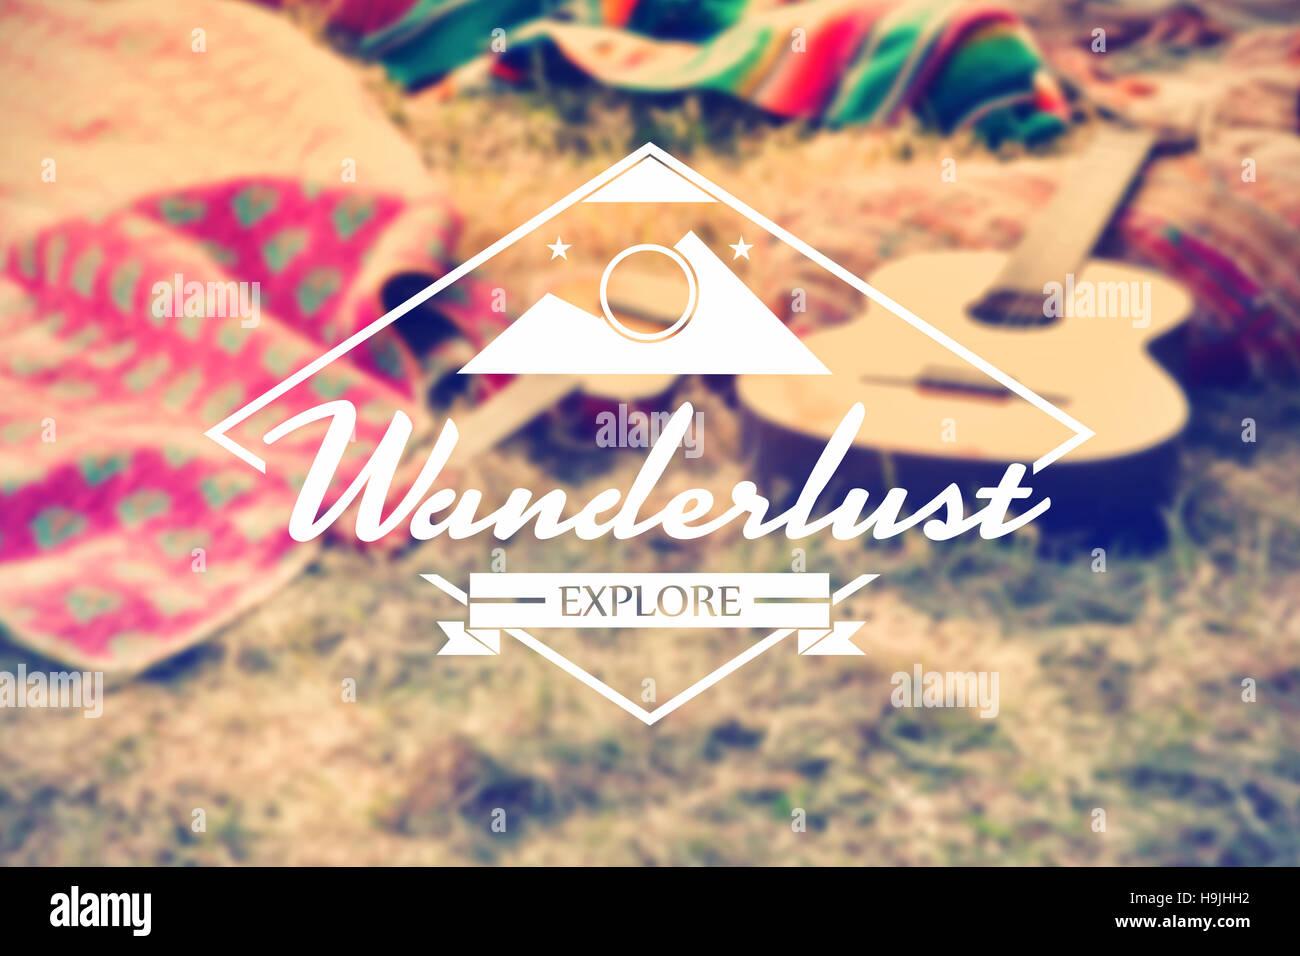 Composite image of wanderlust word - Stock Image